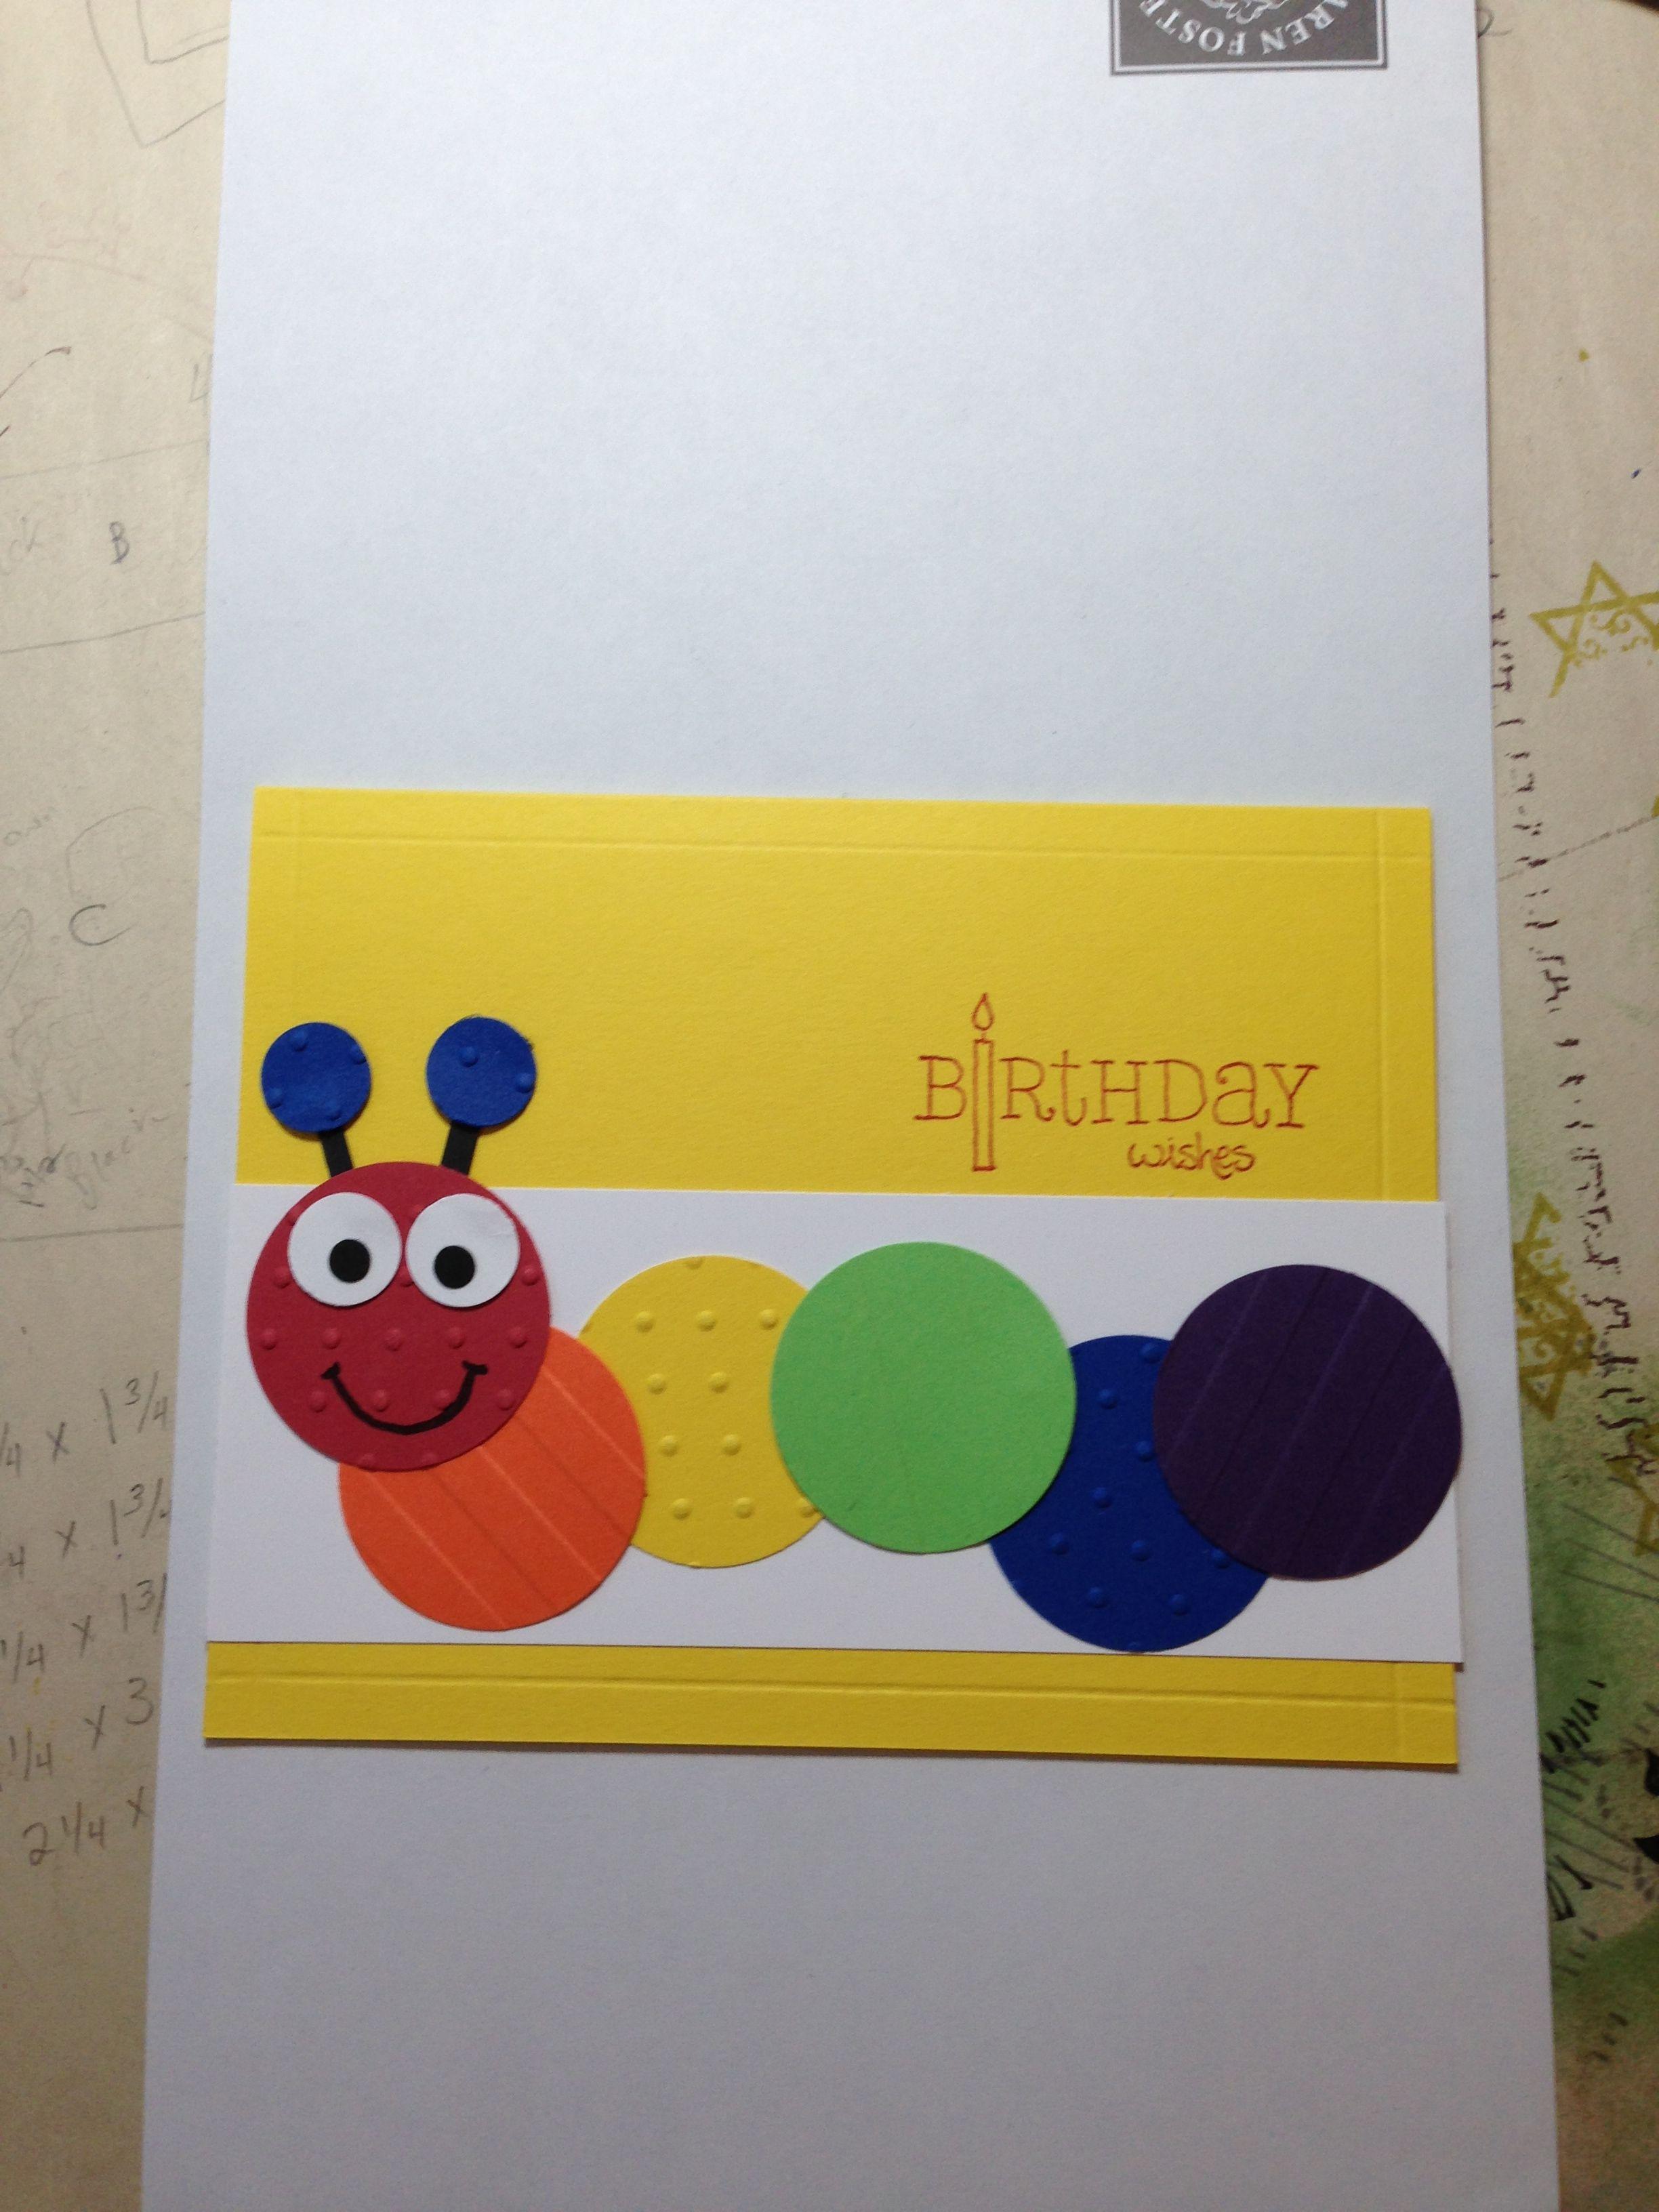 Kid S Birthday Card Cards Pinterest Kids Birthday Cards Kids Cards Birthday Cards